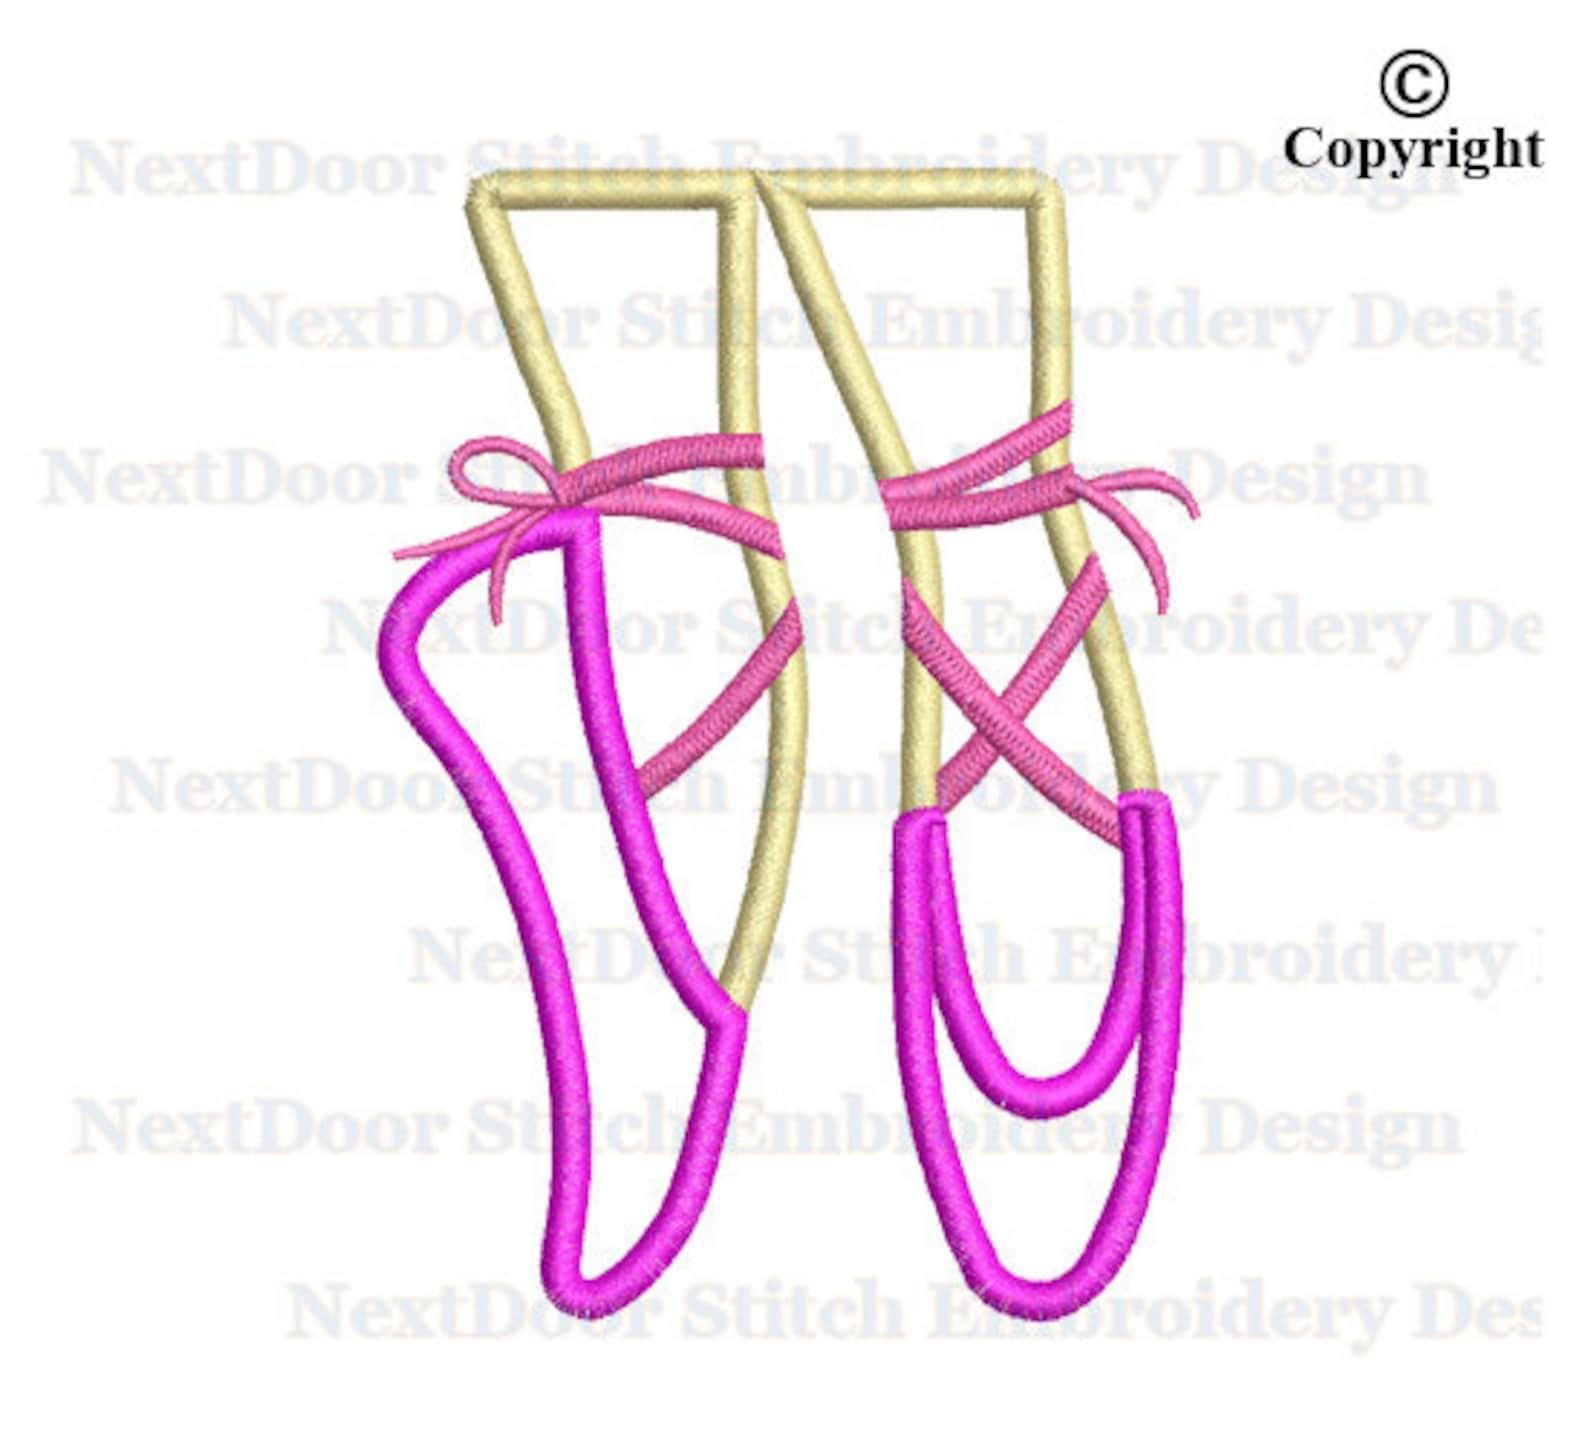 ballet shoes embroidery applique design, ballerina dancing applique download, sh-004